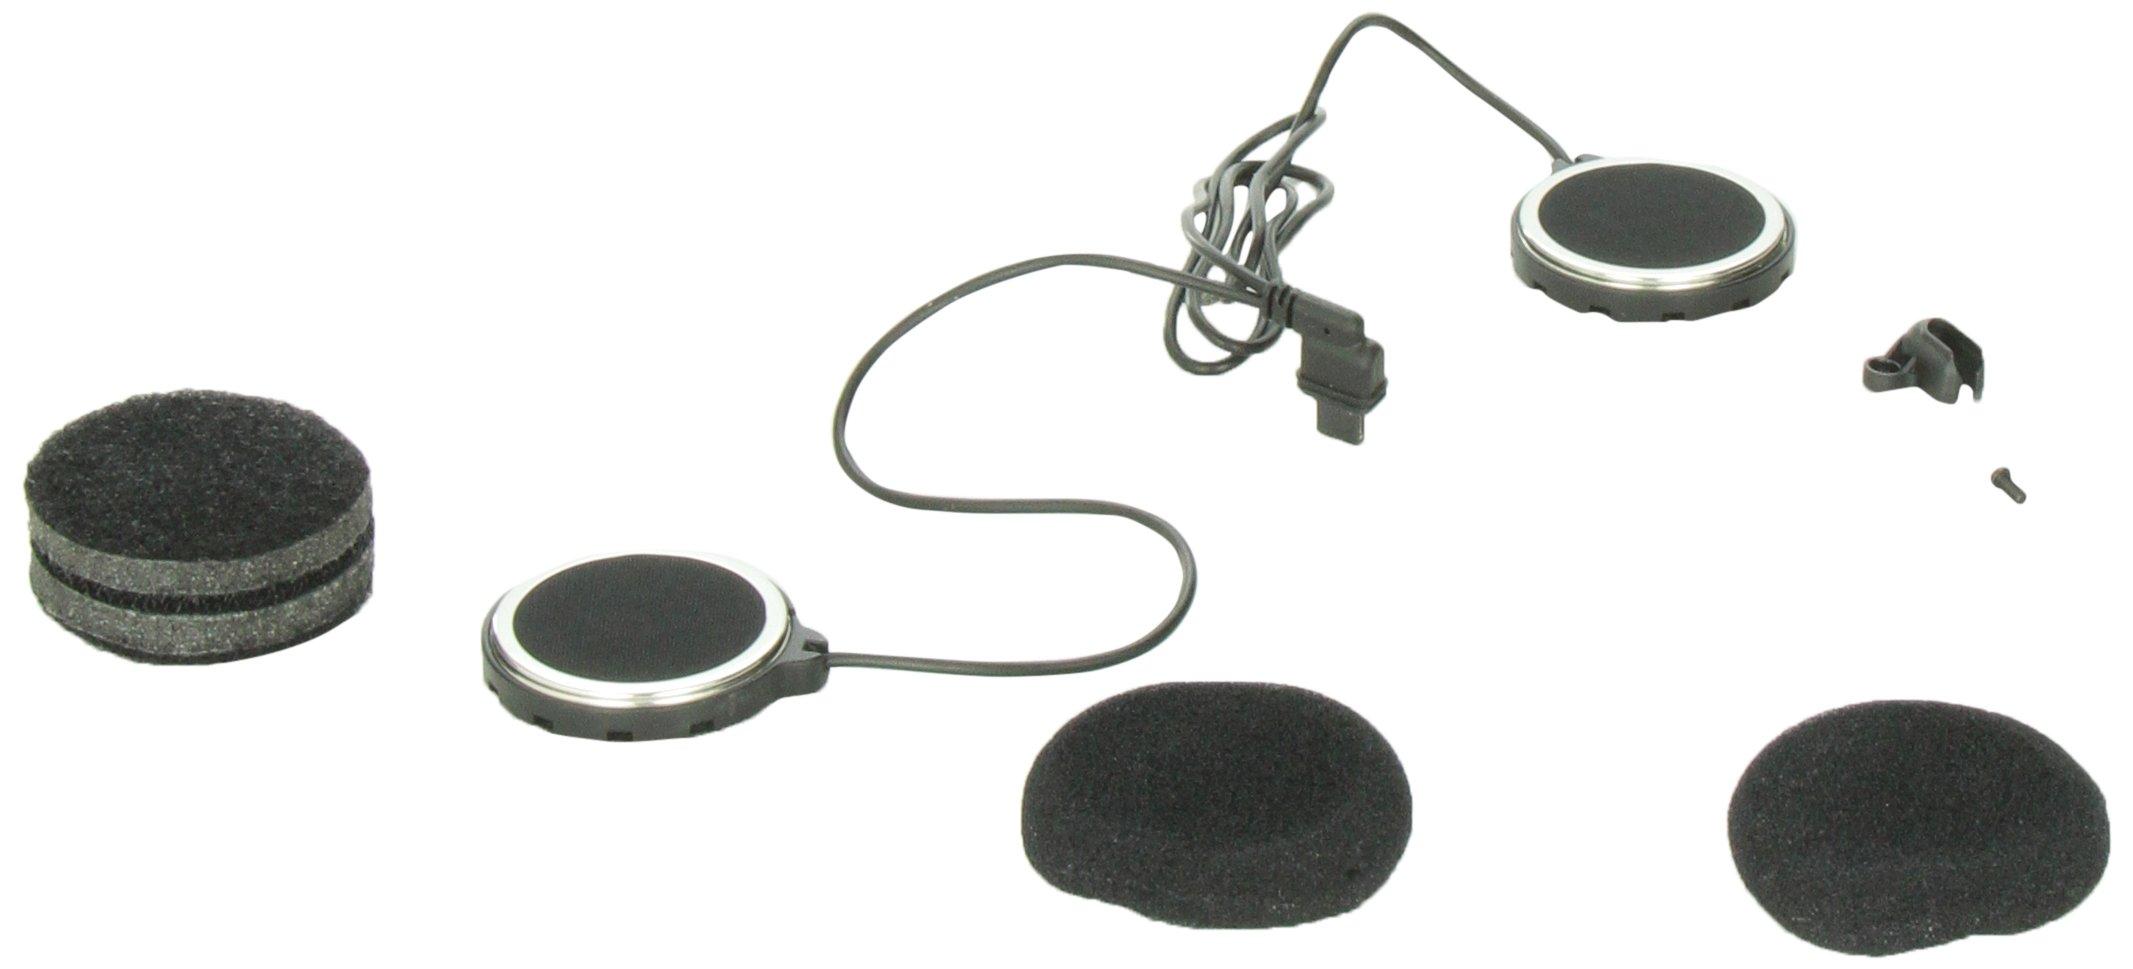 Sena 20S-A0306 Multi Color One Size 20S Speakers